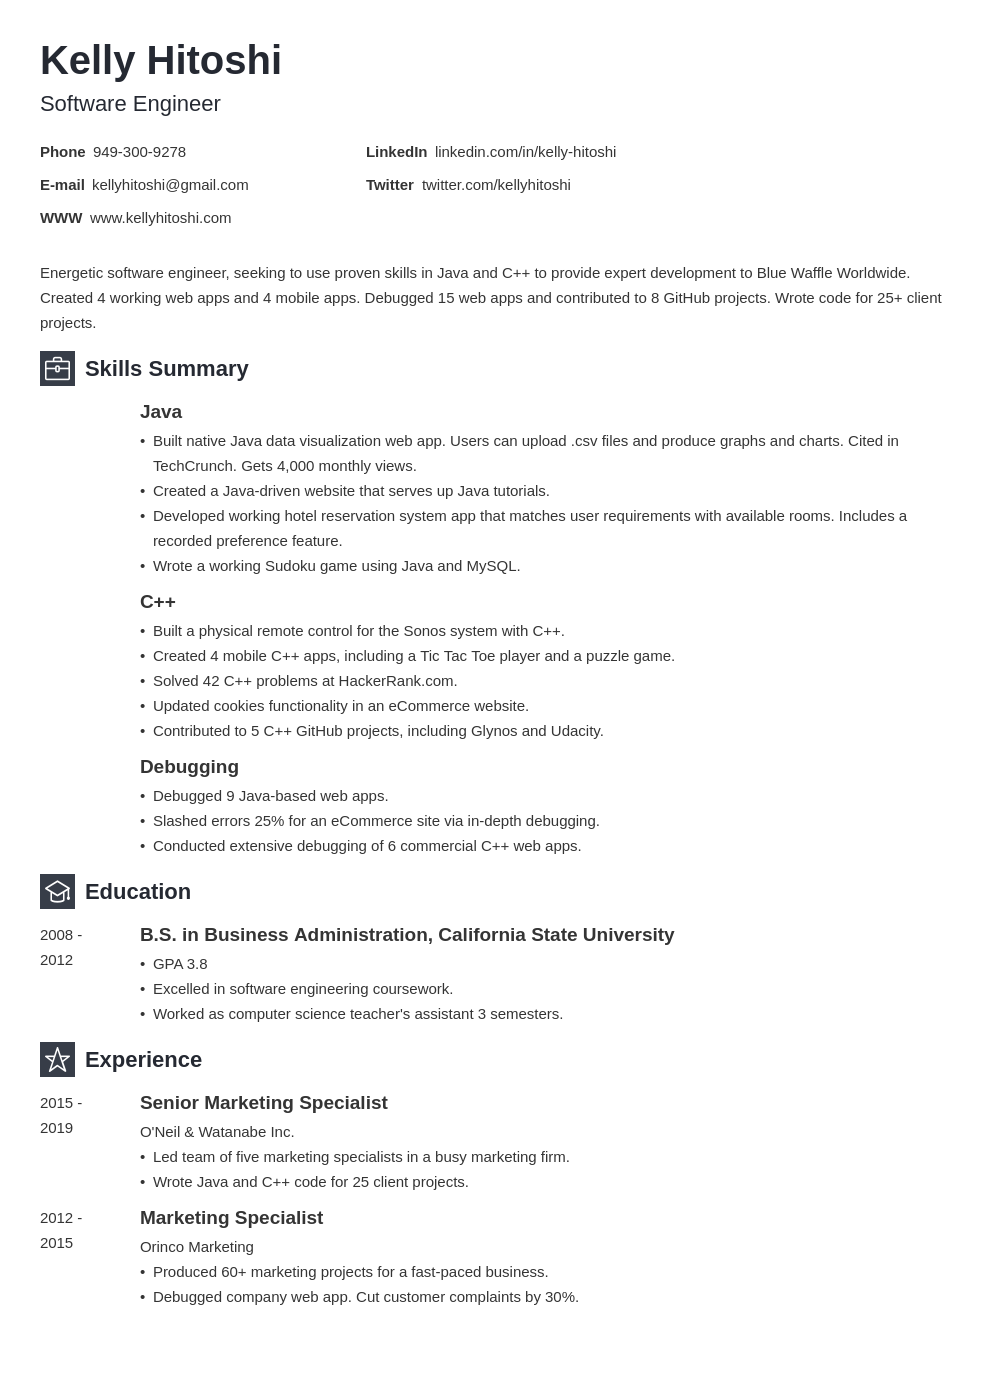 resume career change template newcast uk